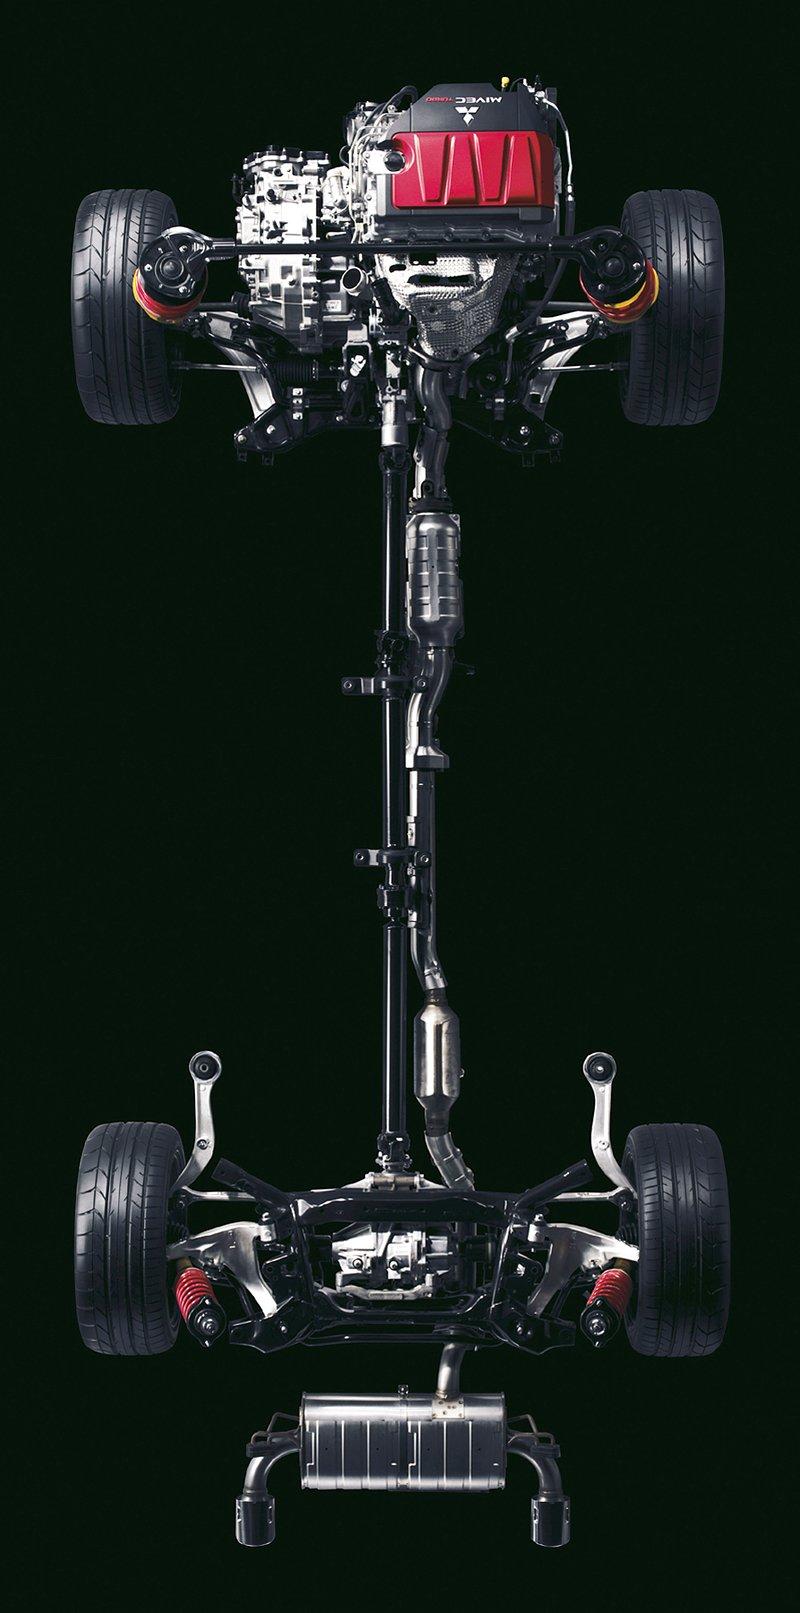 Mitsubishi Lancer Evo X loví u konkurence: - fotka 40